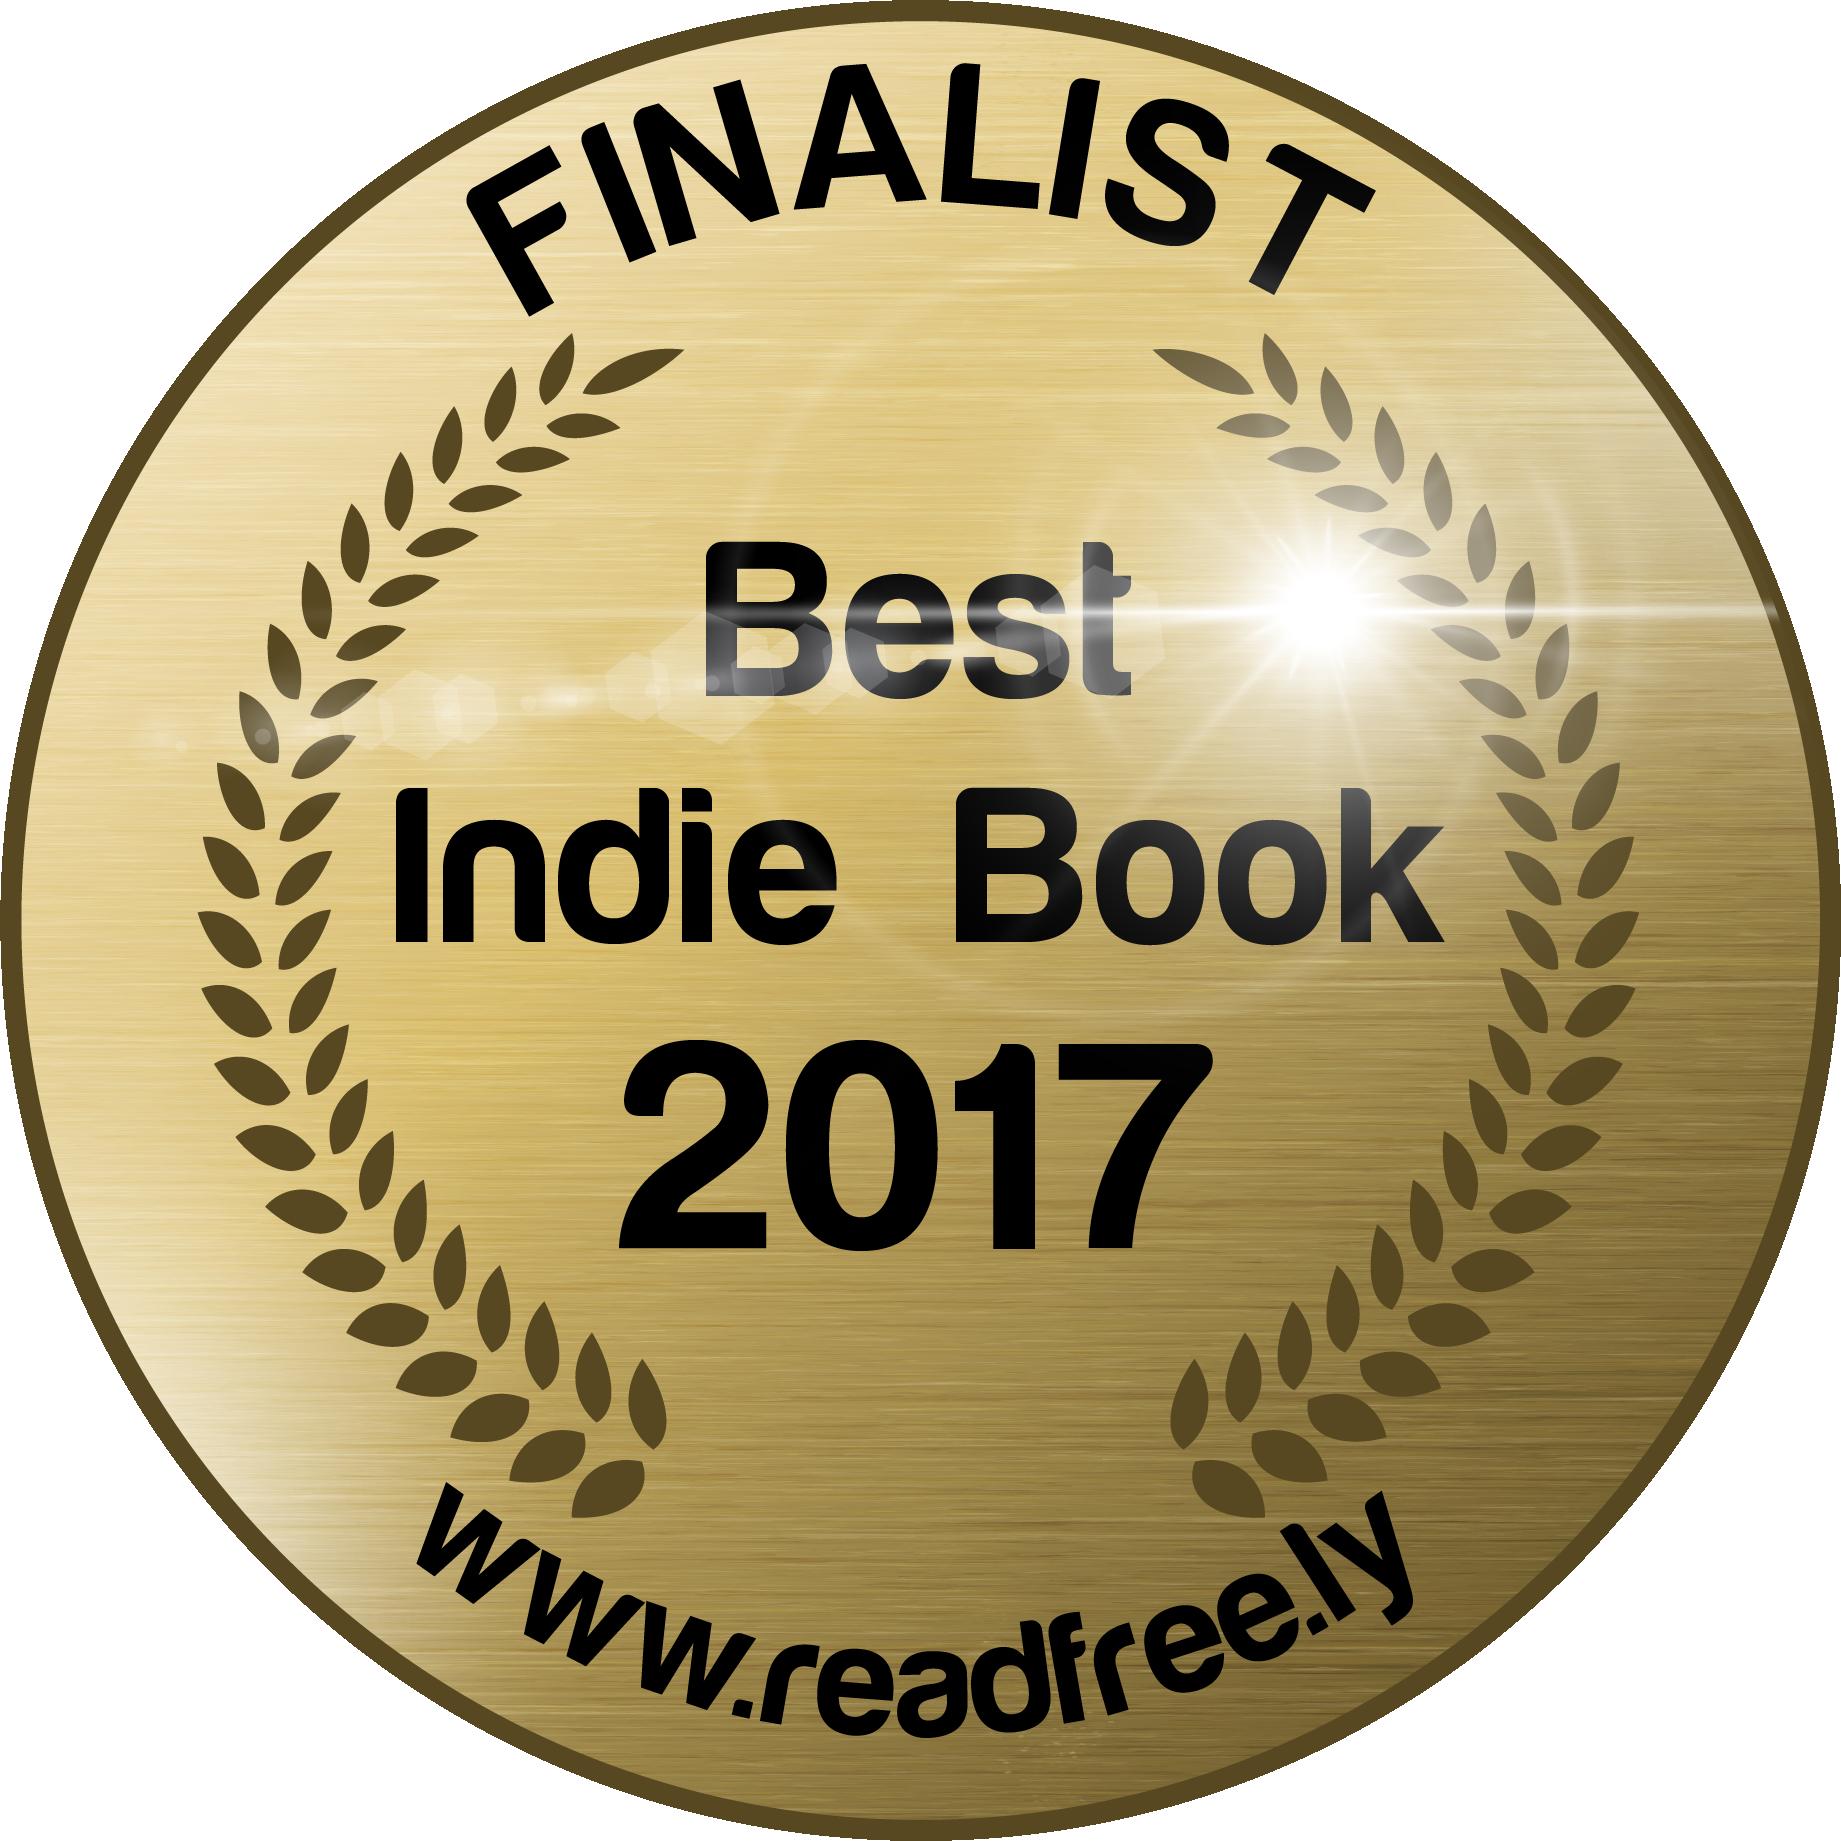 Best Indie Book 2017 - FINALIST.png